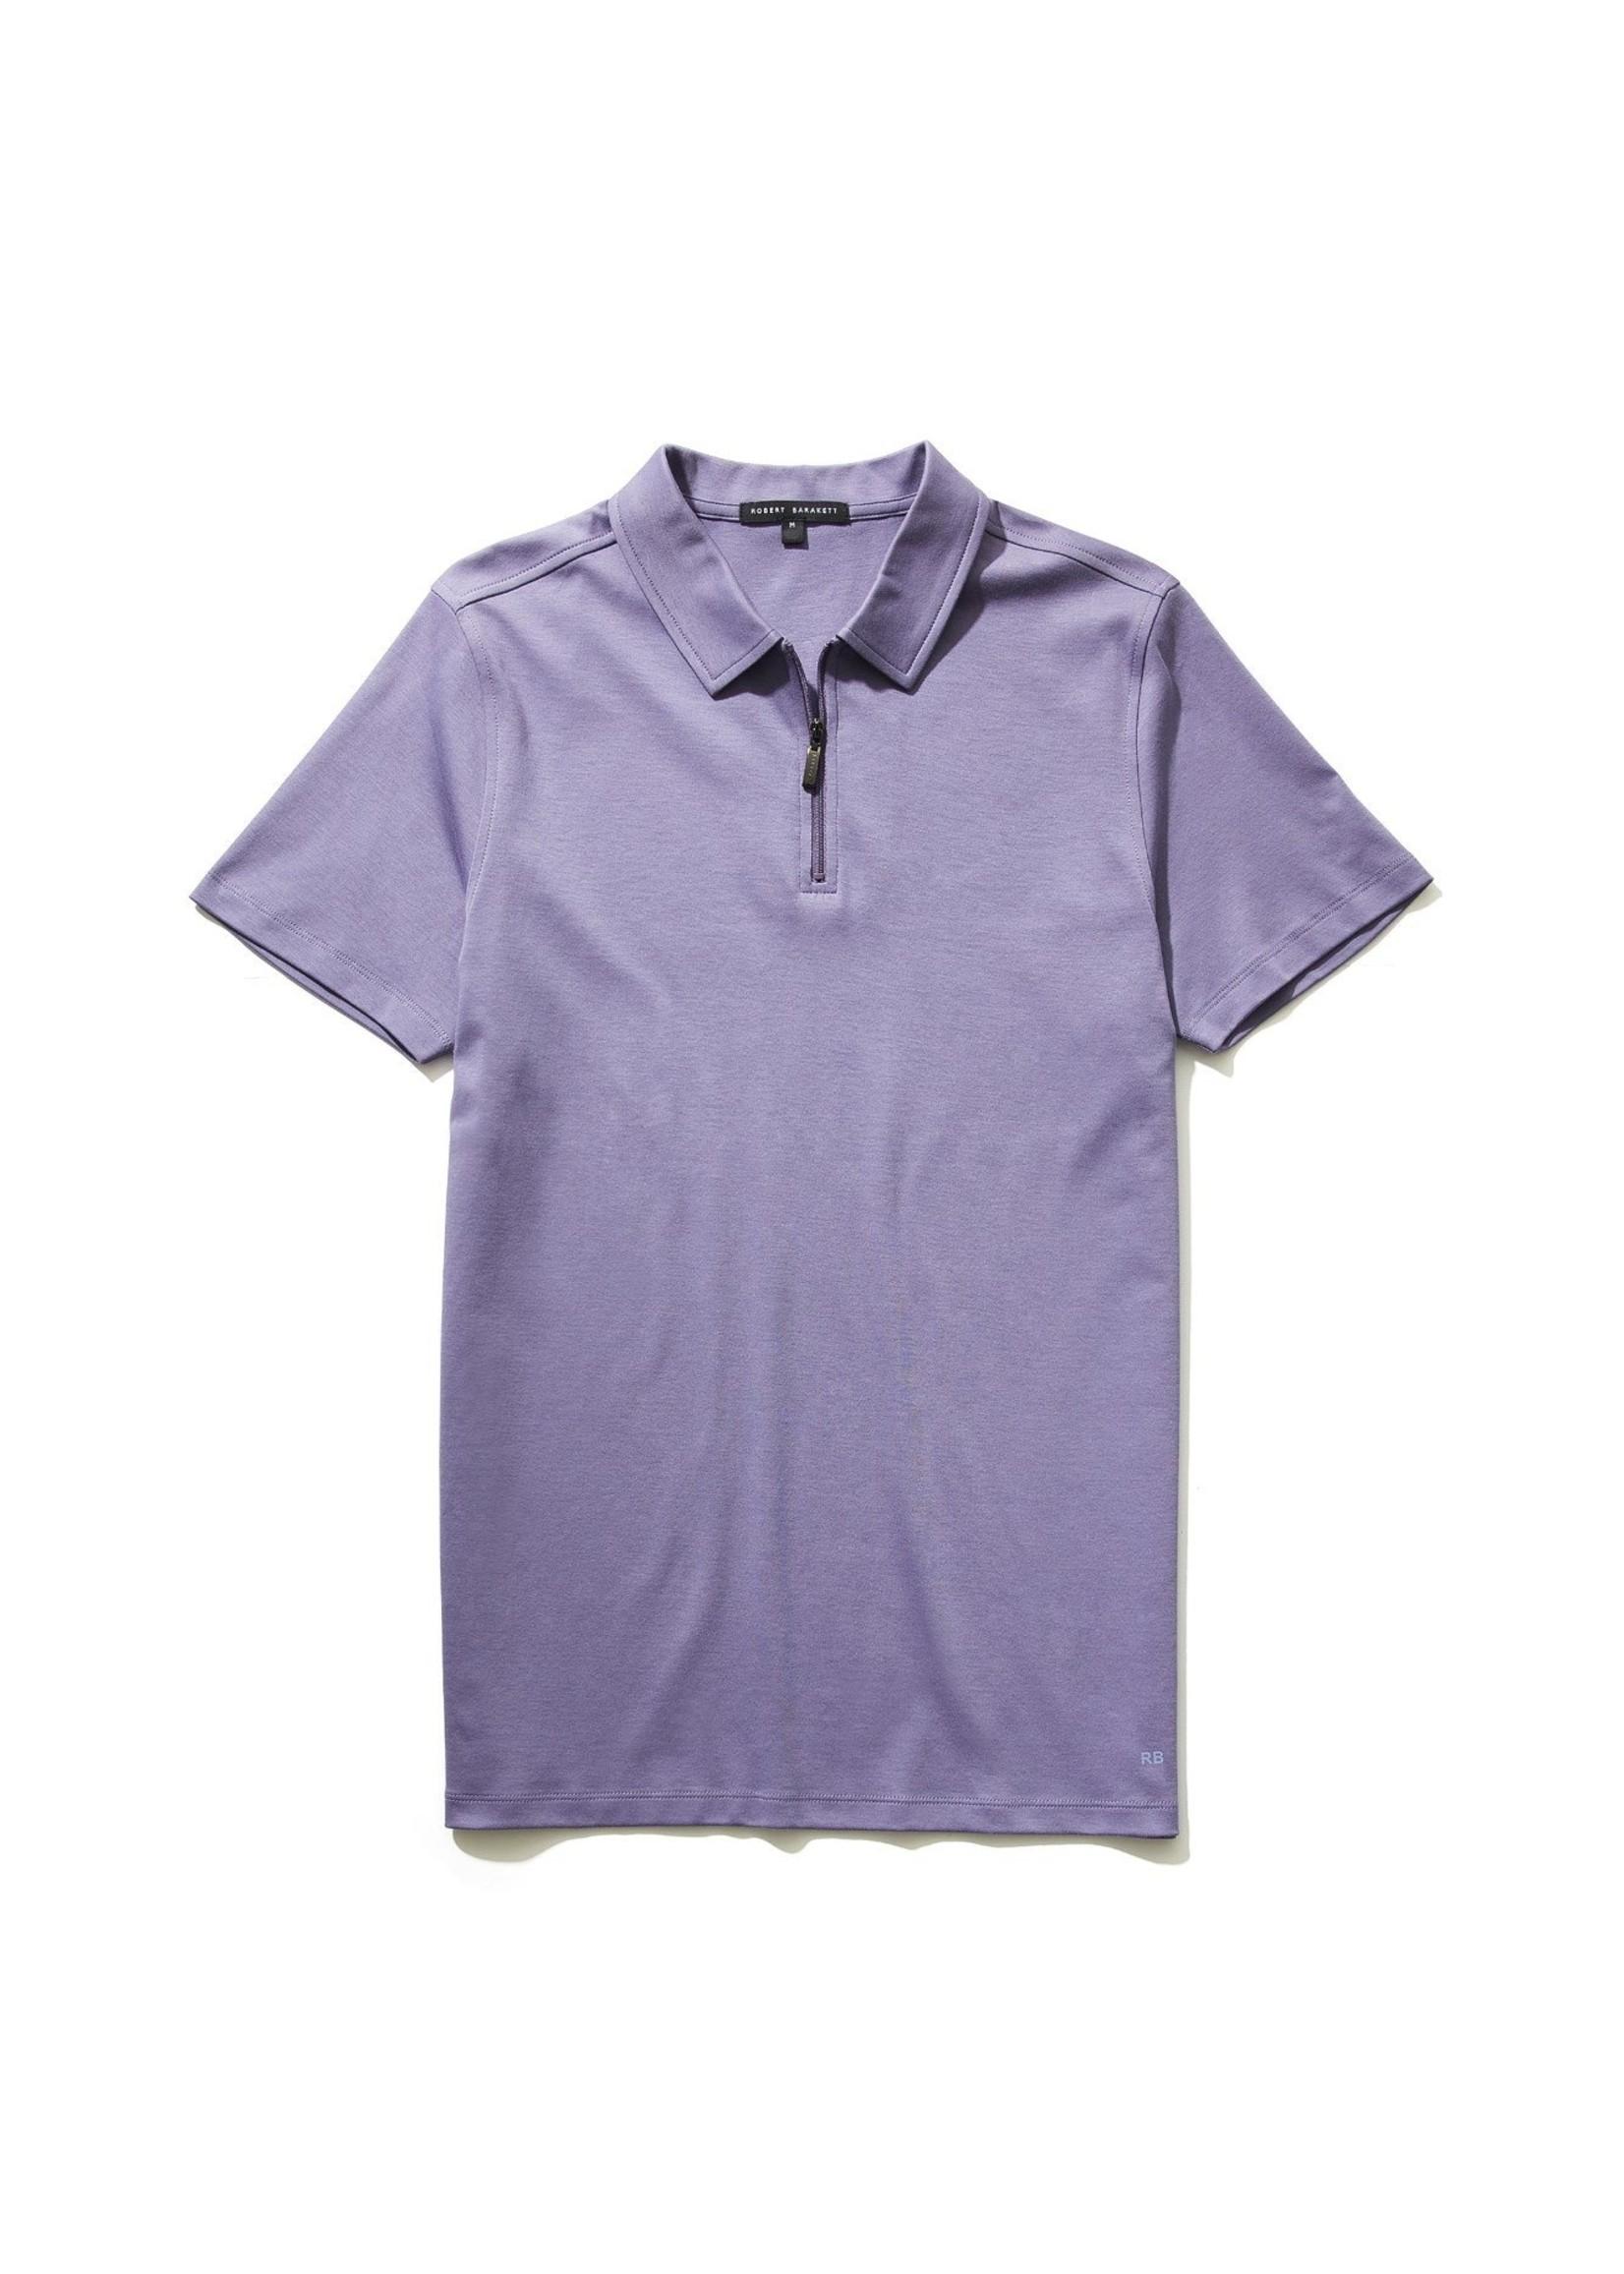 Robert Barakett GEORGIA Zipper Polo Foggy Purple